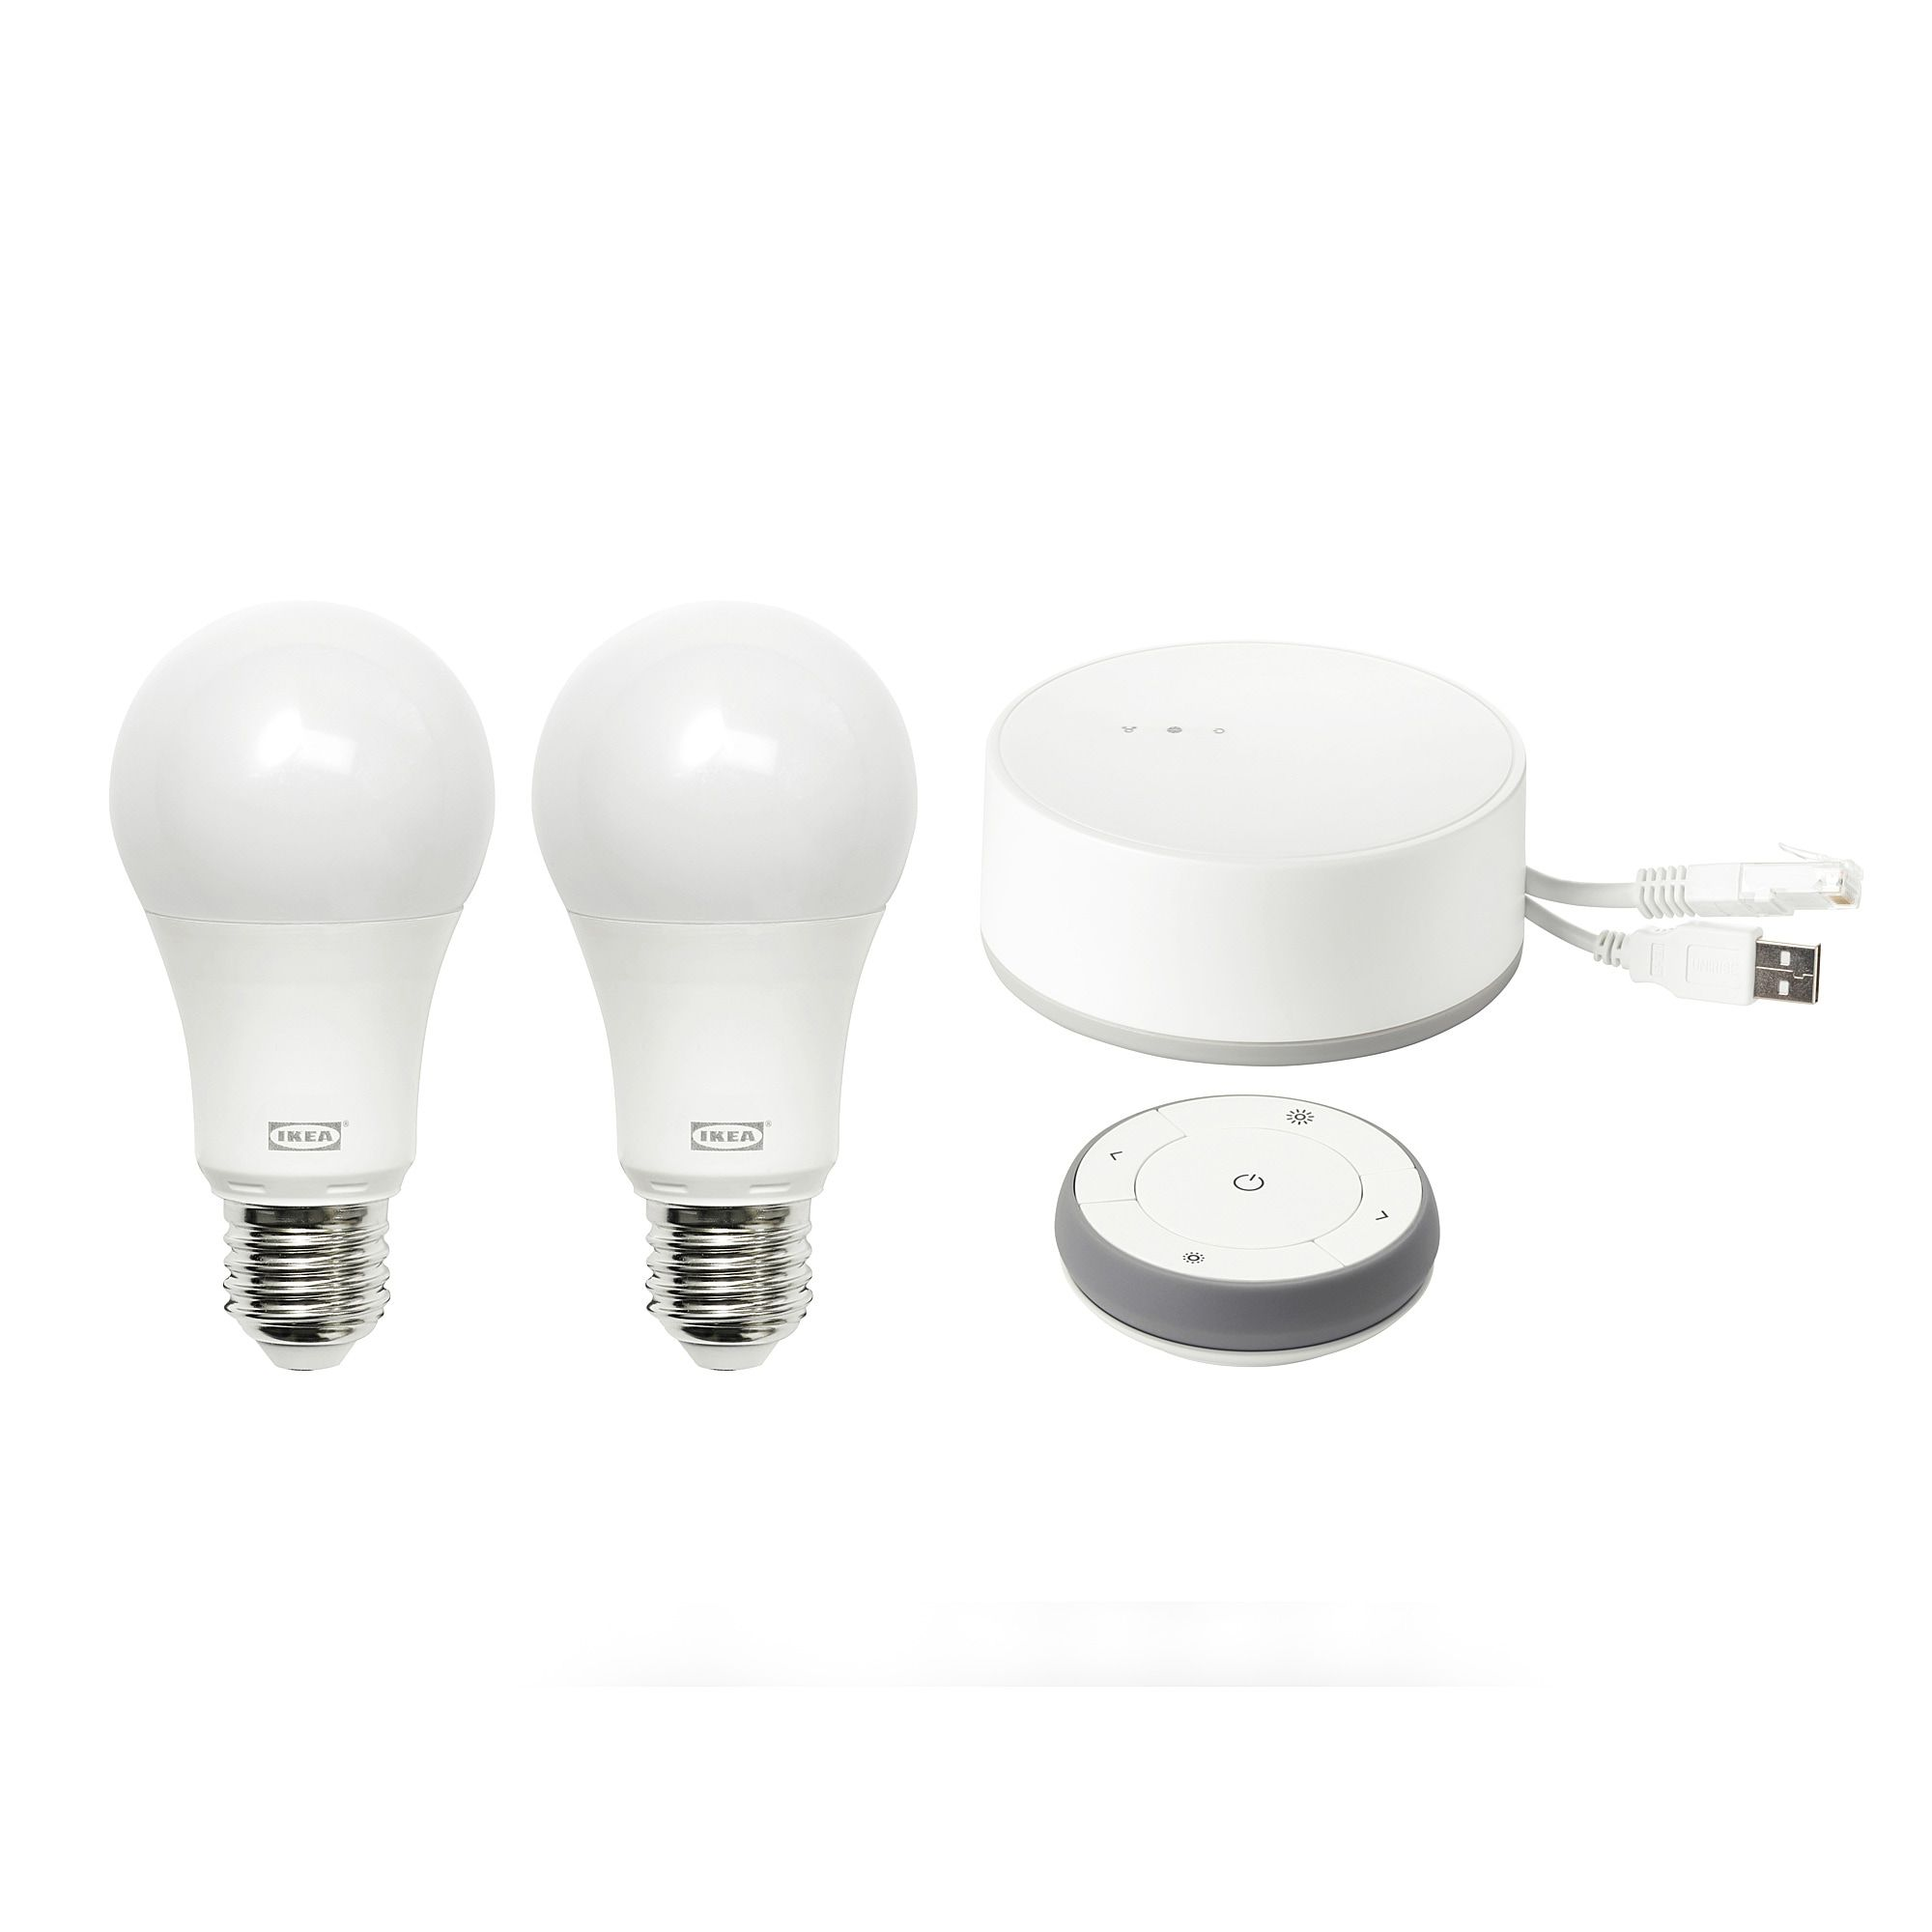 Tradfri Gateway Kit Color And White Spectrum Ikea Led Light Bulbs Light Bulbs Smart Lighting